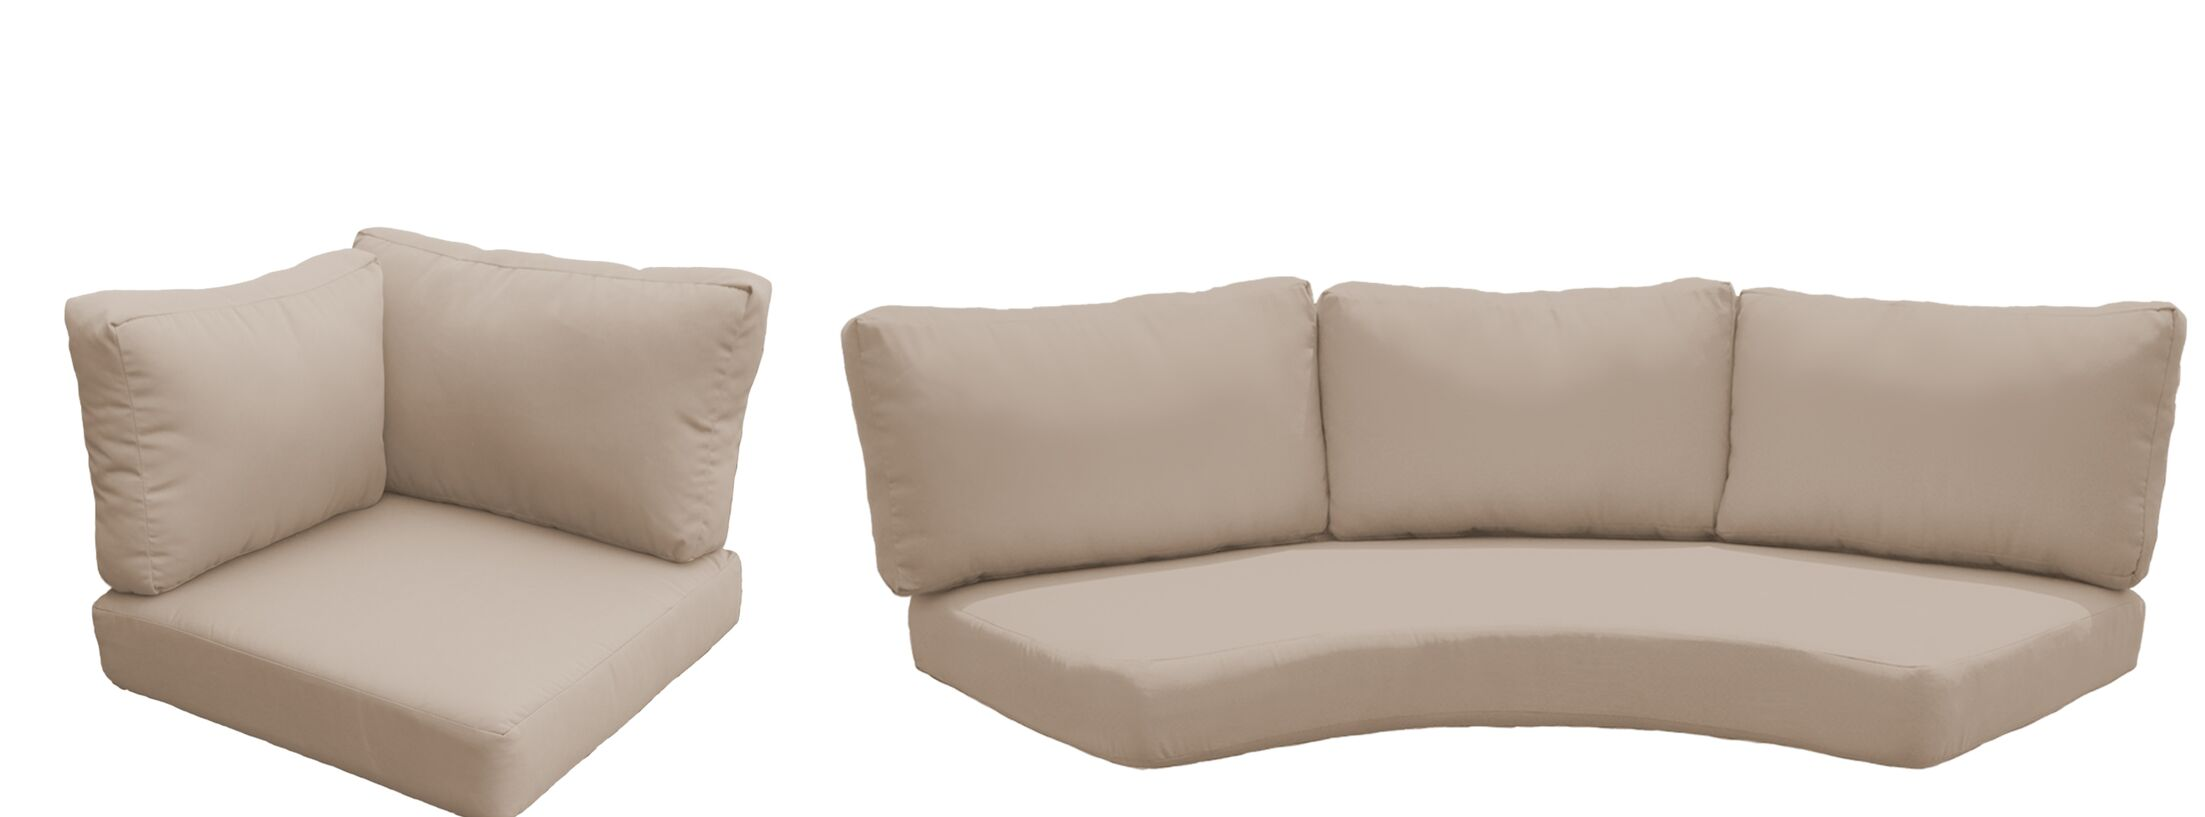 East Village 10 Piece Outdoor Cushion Set Fabric: Wheat